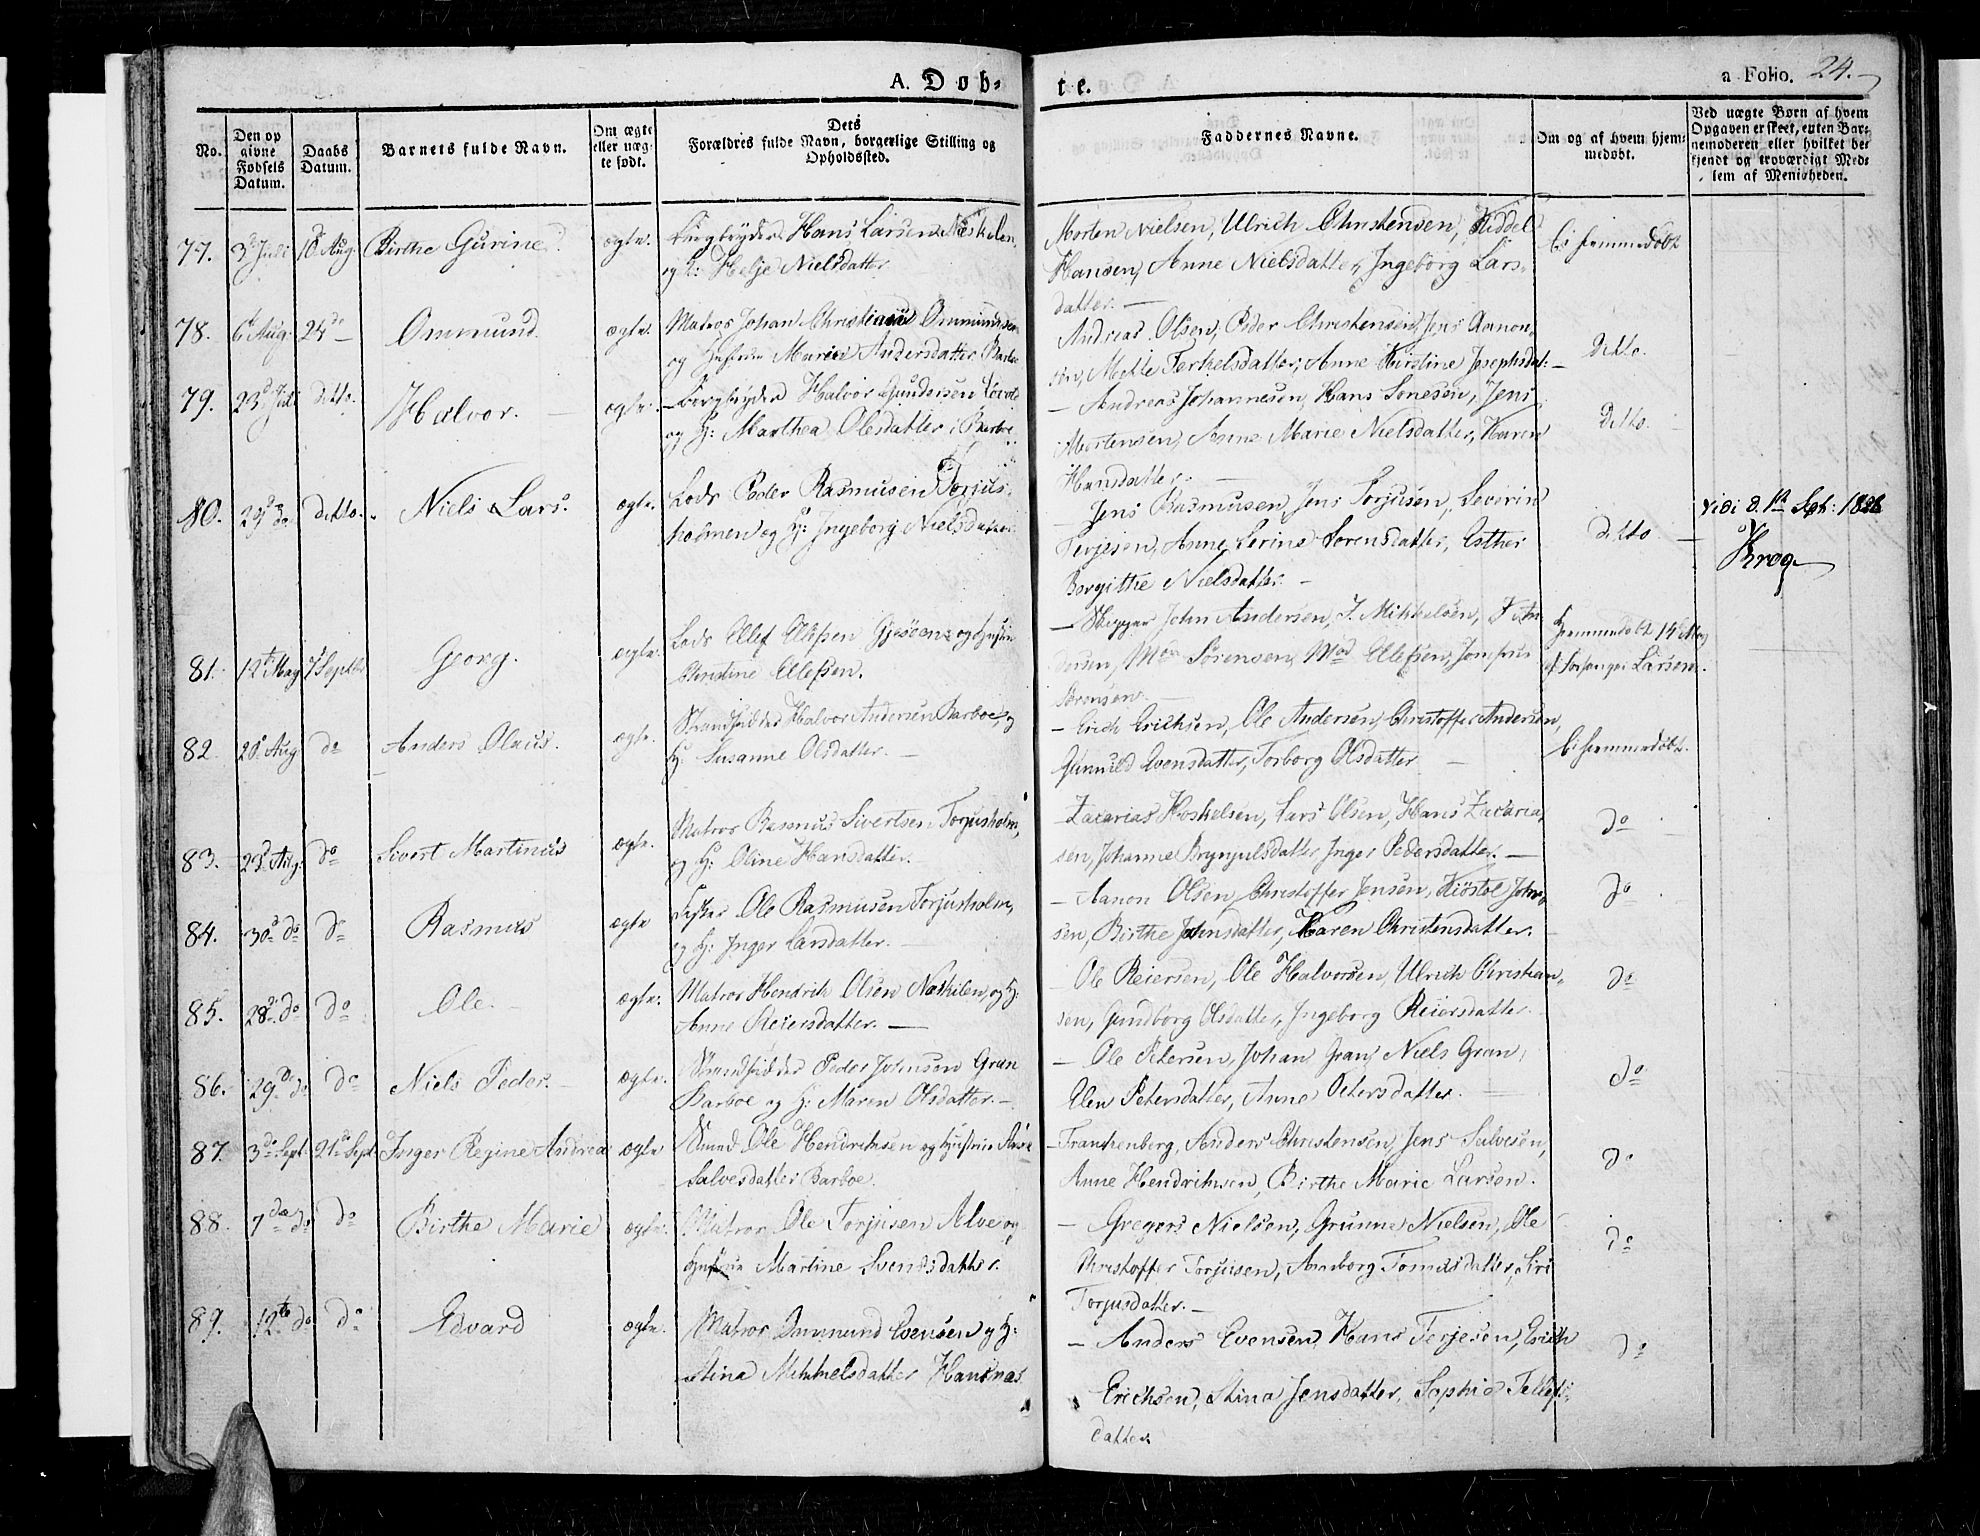 SAK, Tromøy sokneprestkontor, F/Fa/L0003: Ministerialbok nr. A 3, 1825-1837, s. 24